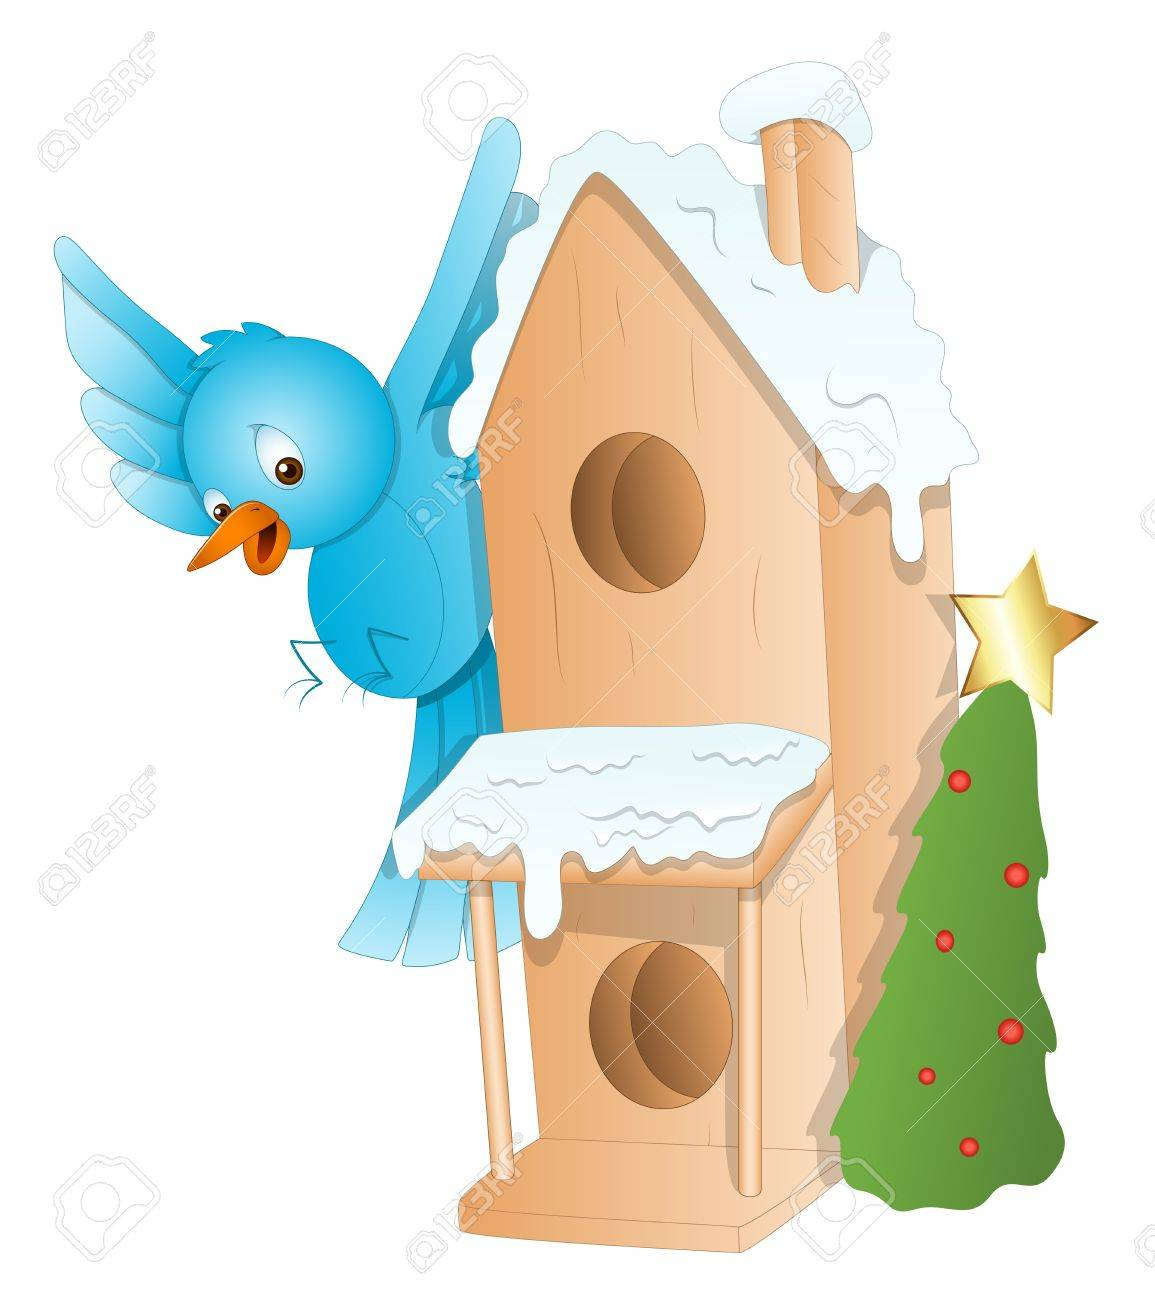 Gingerbread House - Christmas Stock Vector - 16832517